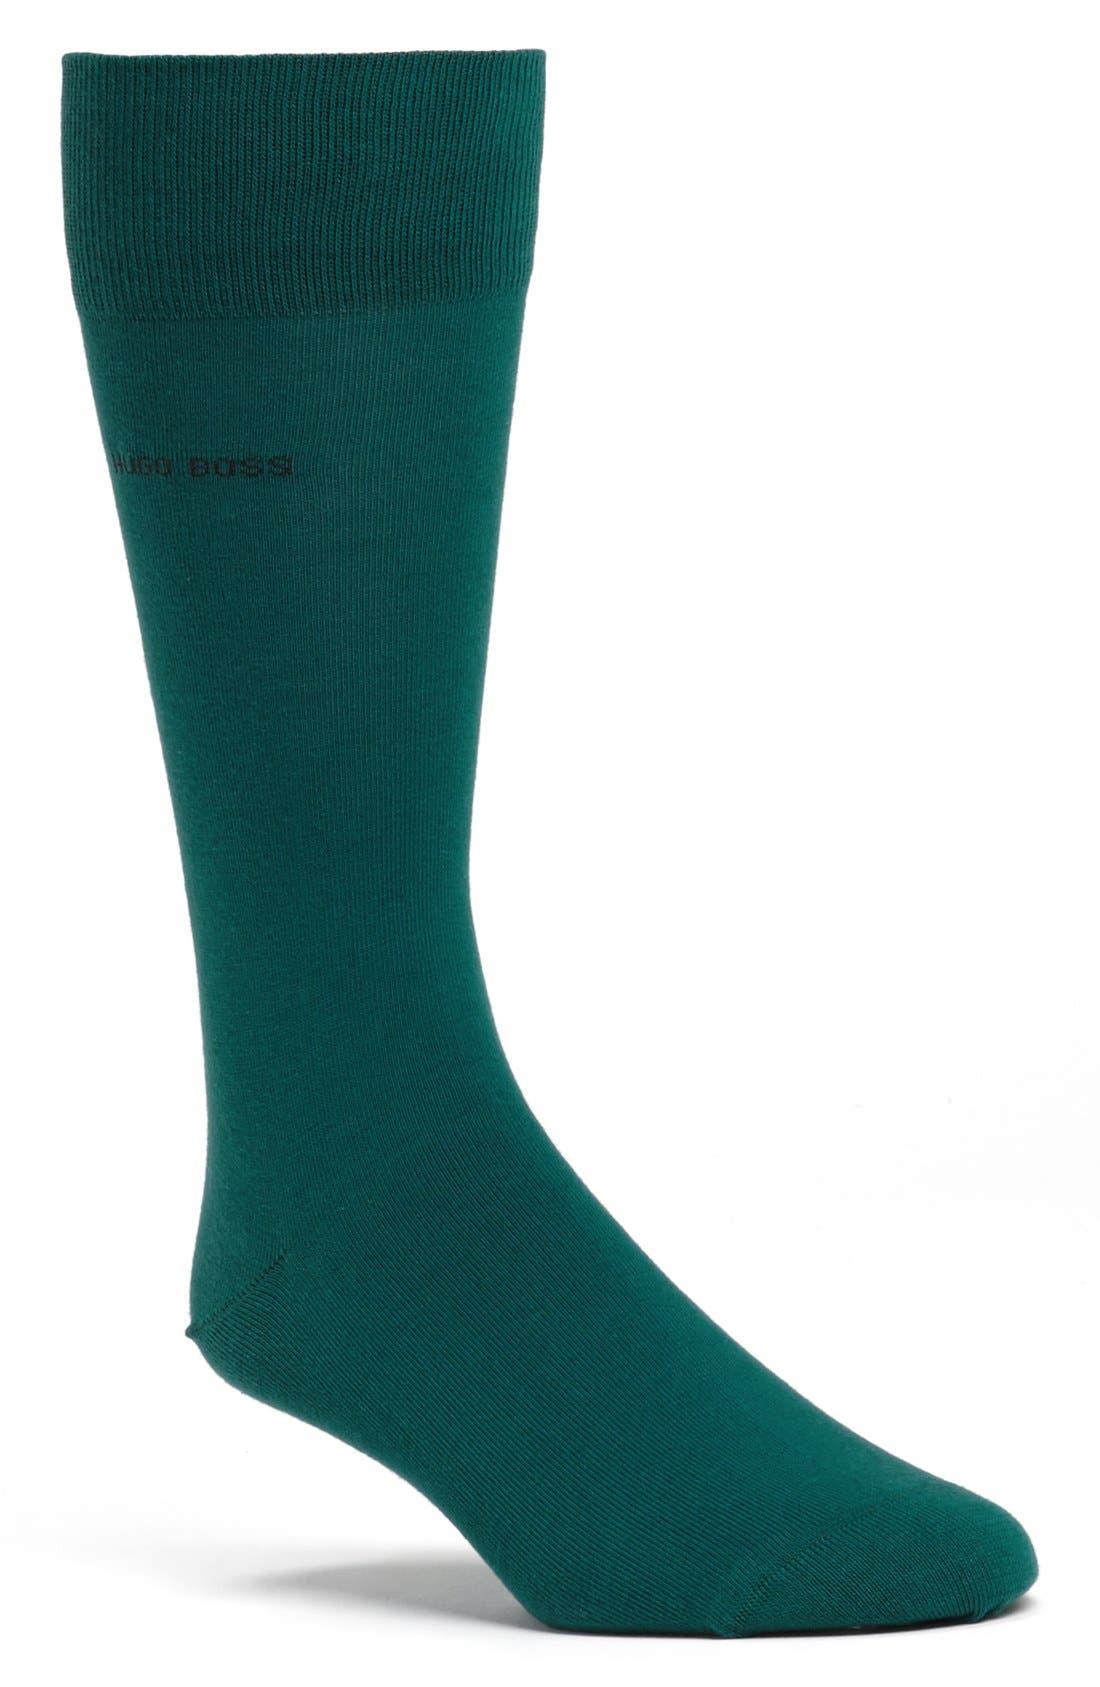 Main Image - BOSS HUGO BOSS 'Marc' Stretch Cotton Socks